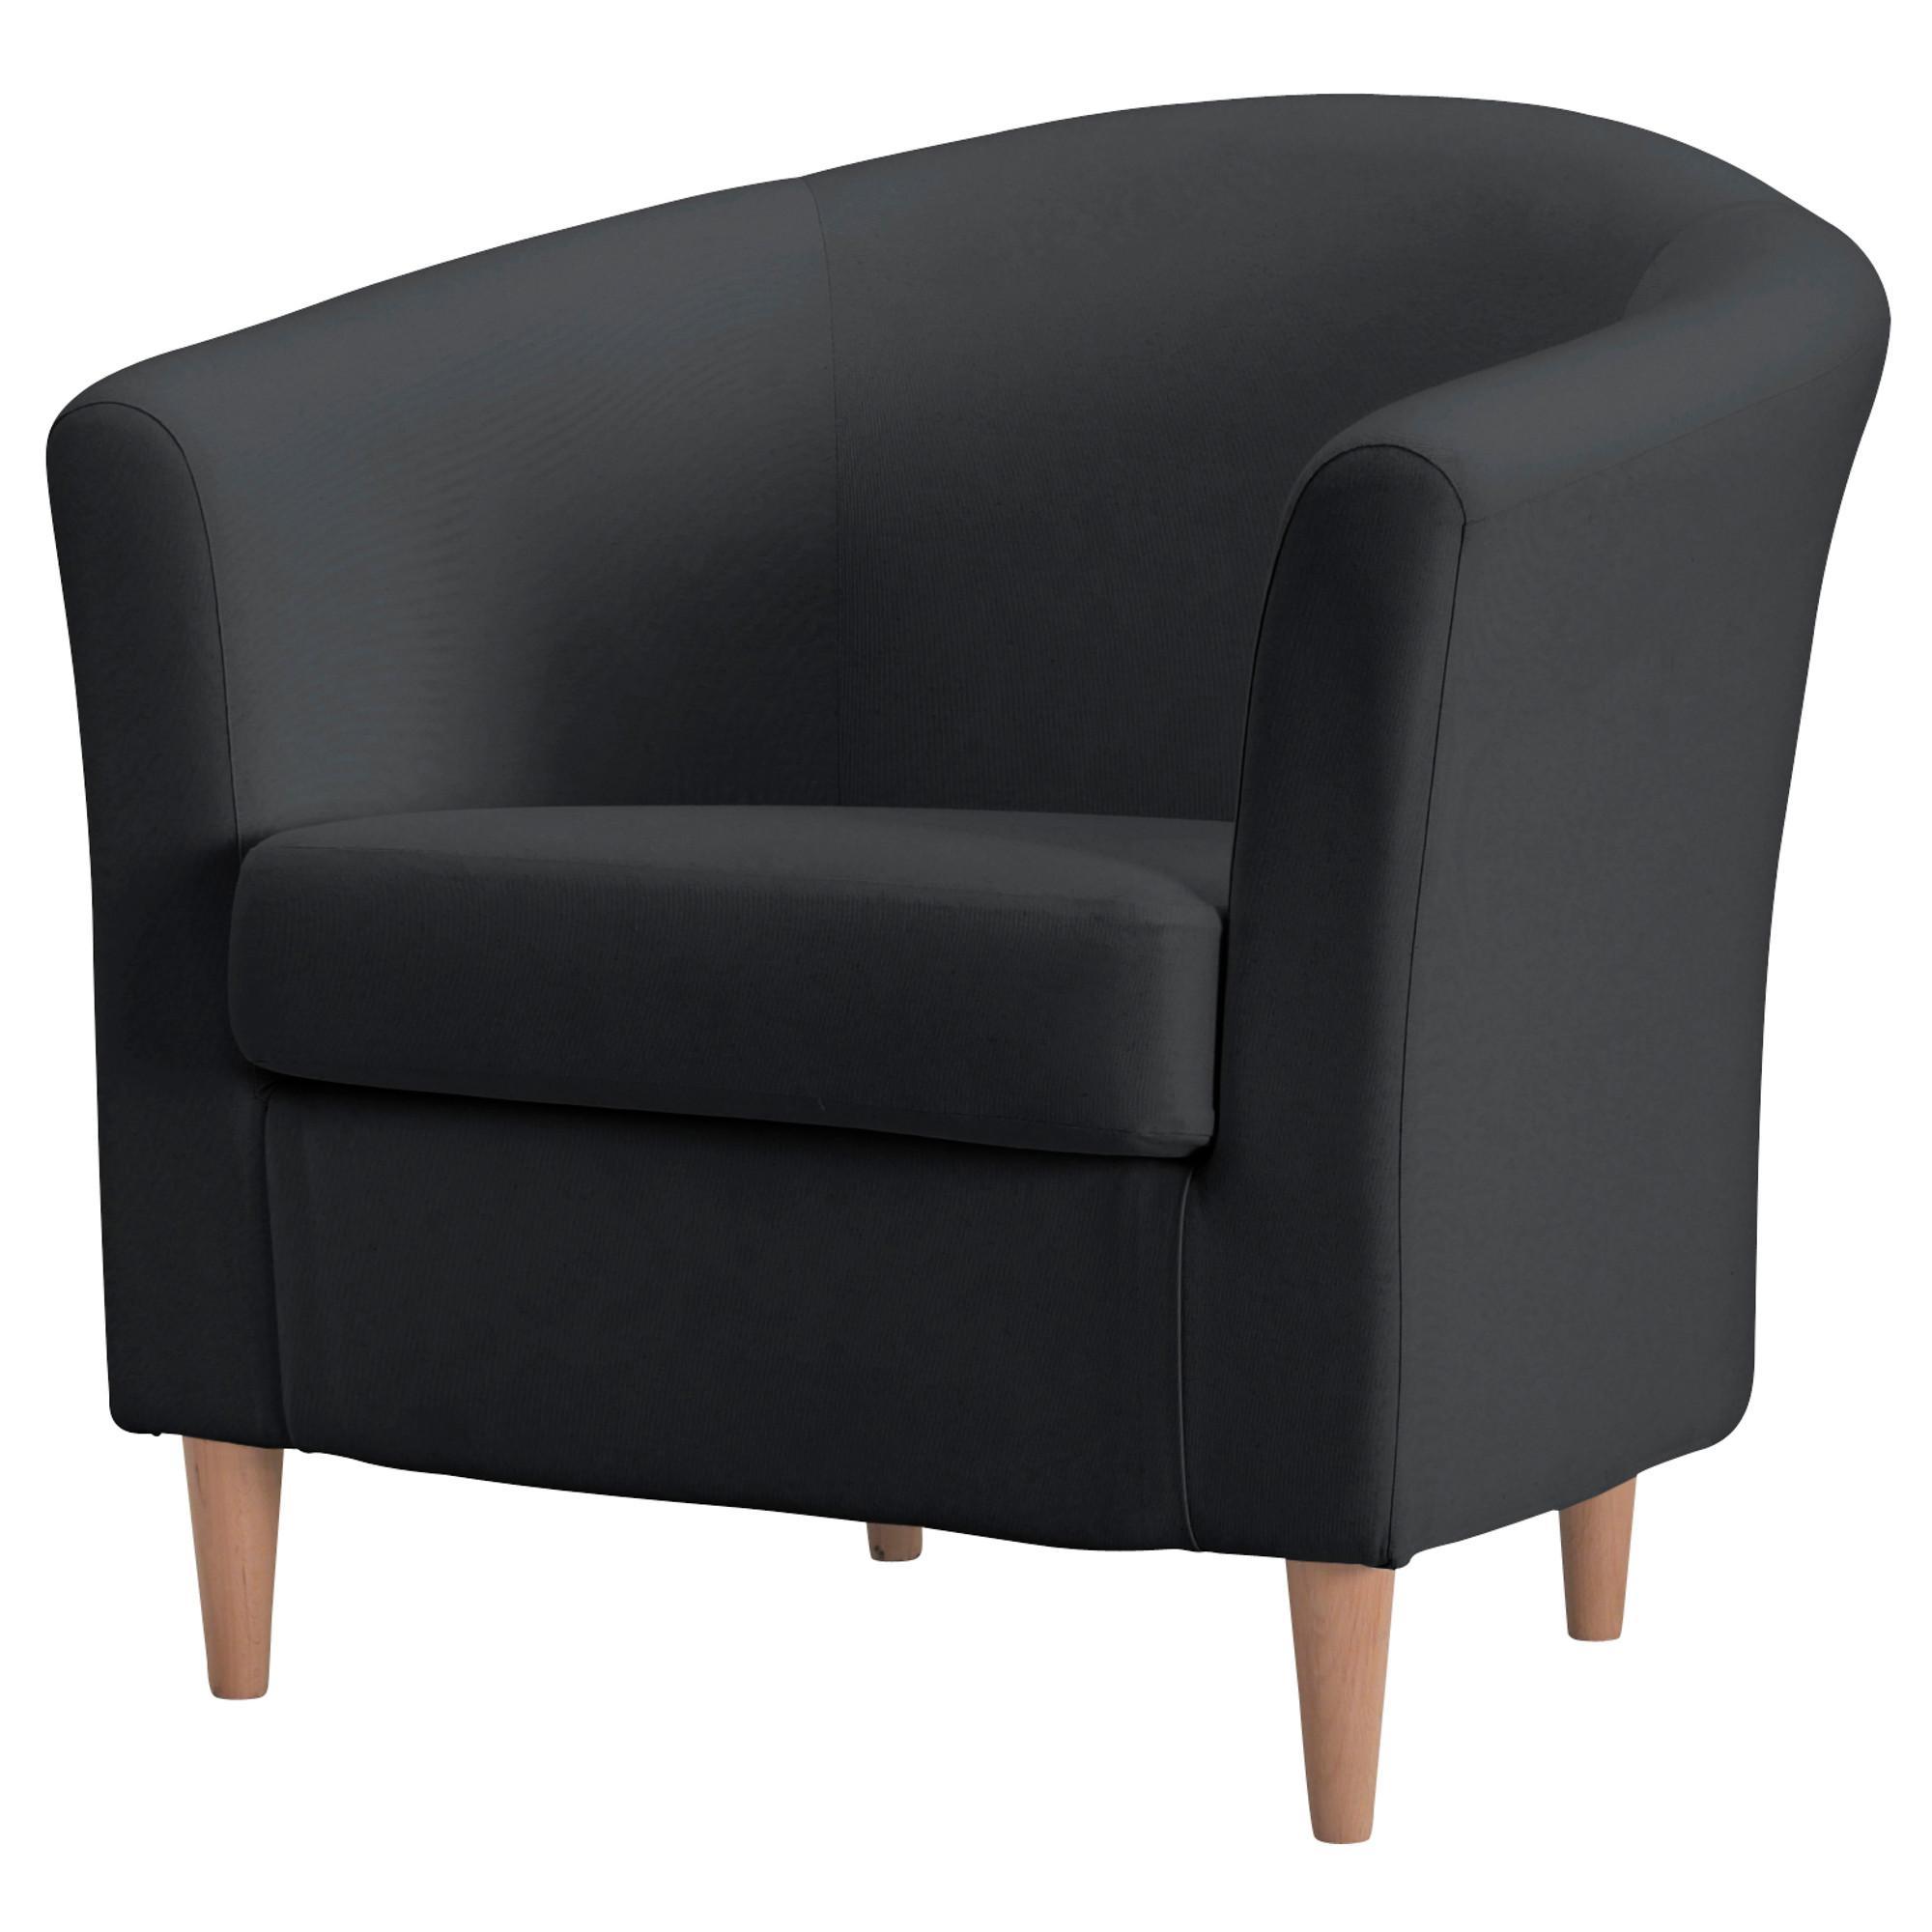 Furniture Home: Lounge Chairs Single Sofa Chairs Modern Elegant Inside Sofa Chairs (Image 8 of 20)